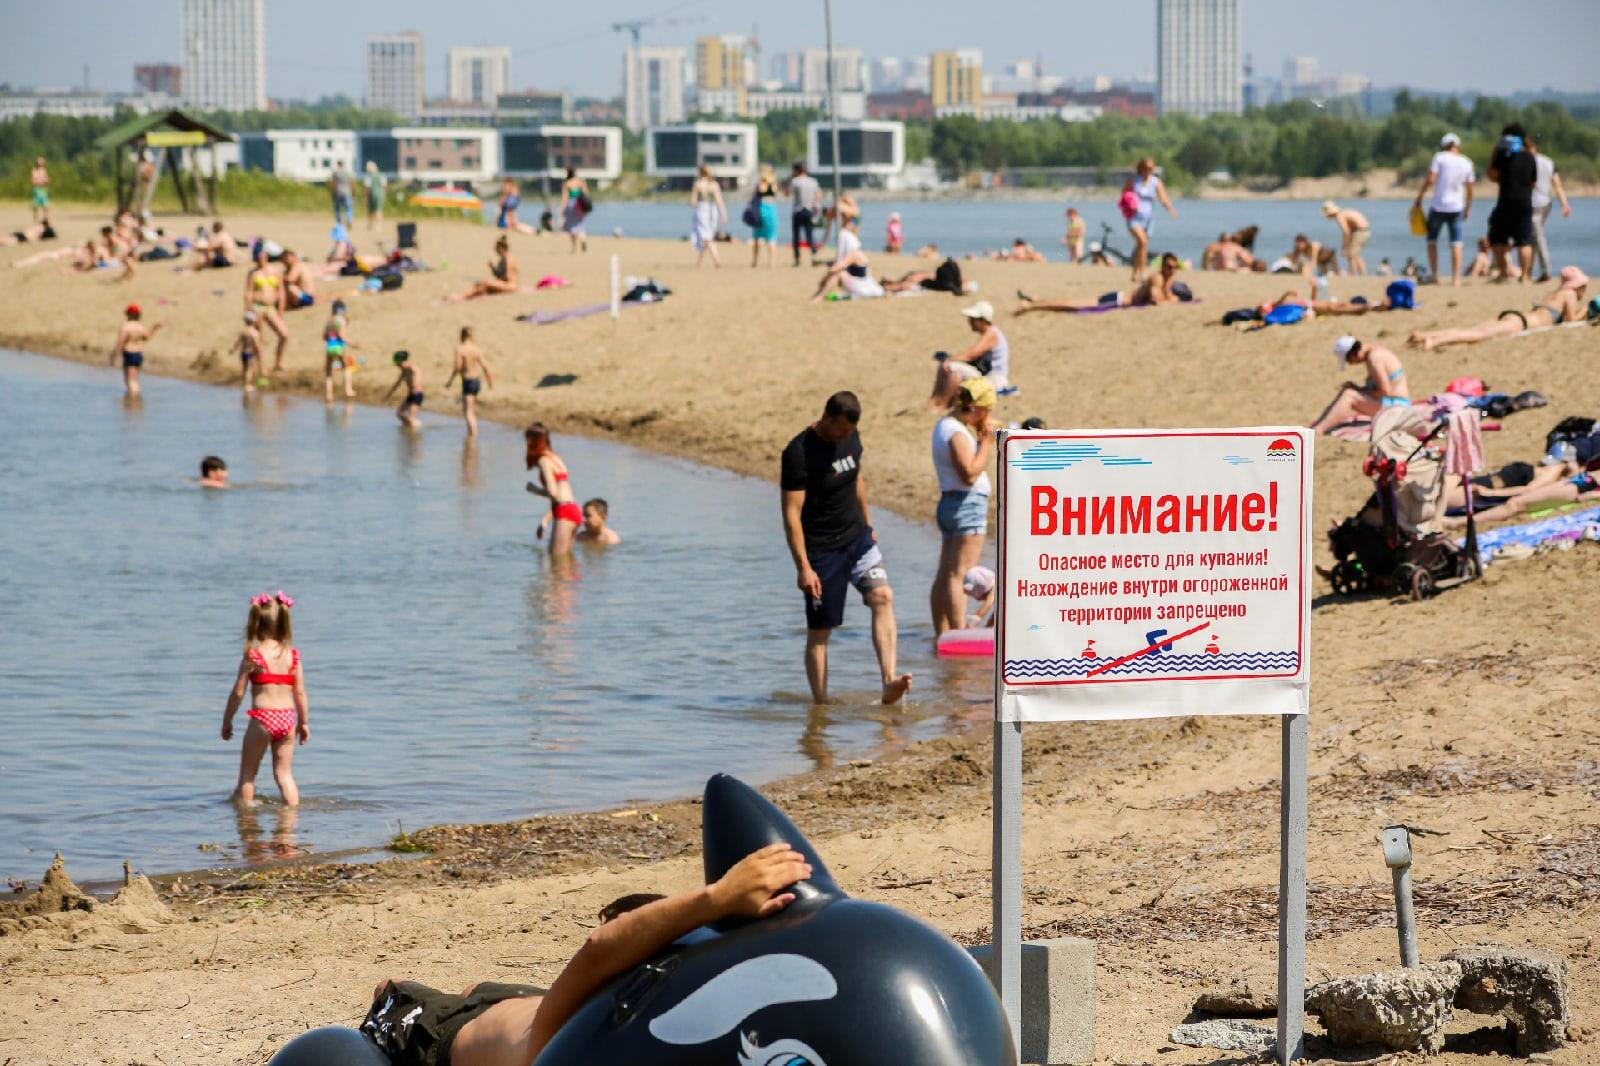 фото Бикини, селфи и горячий песок: 10 жарких фото с Бугринского пляжа в Новосибирске 5